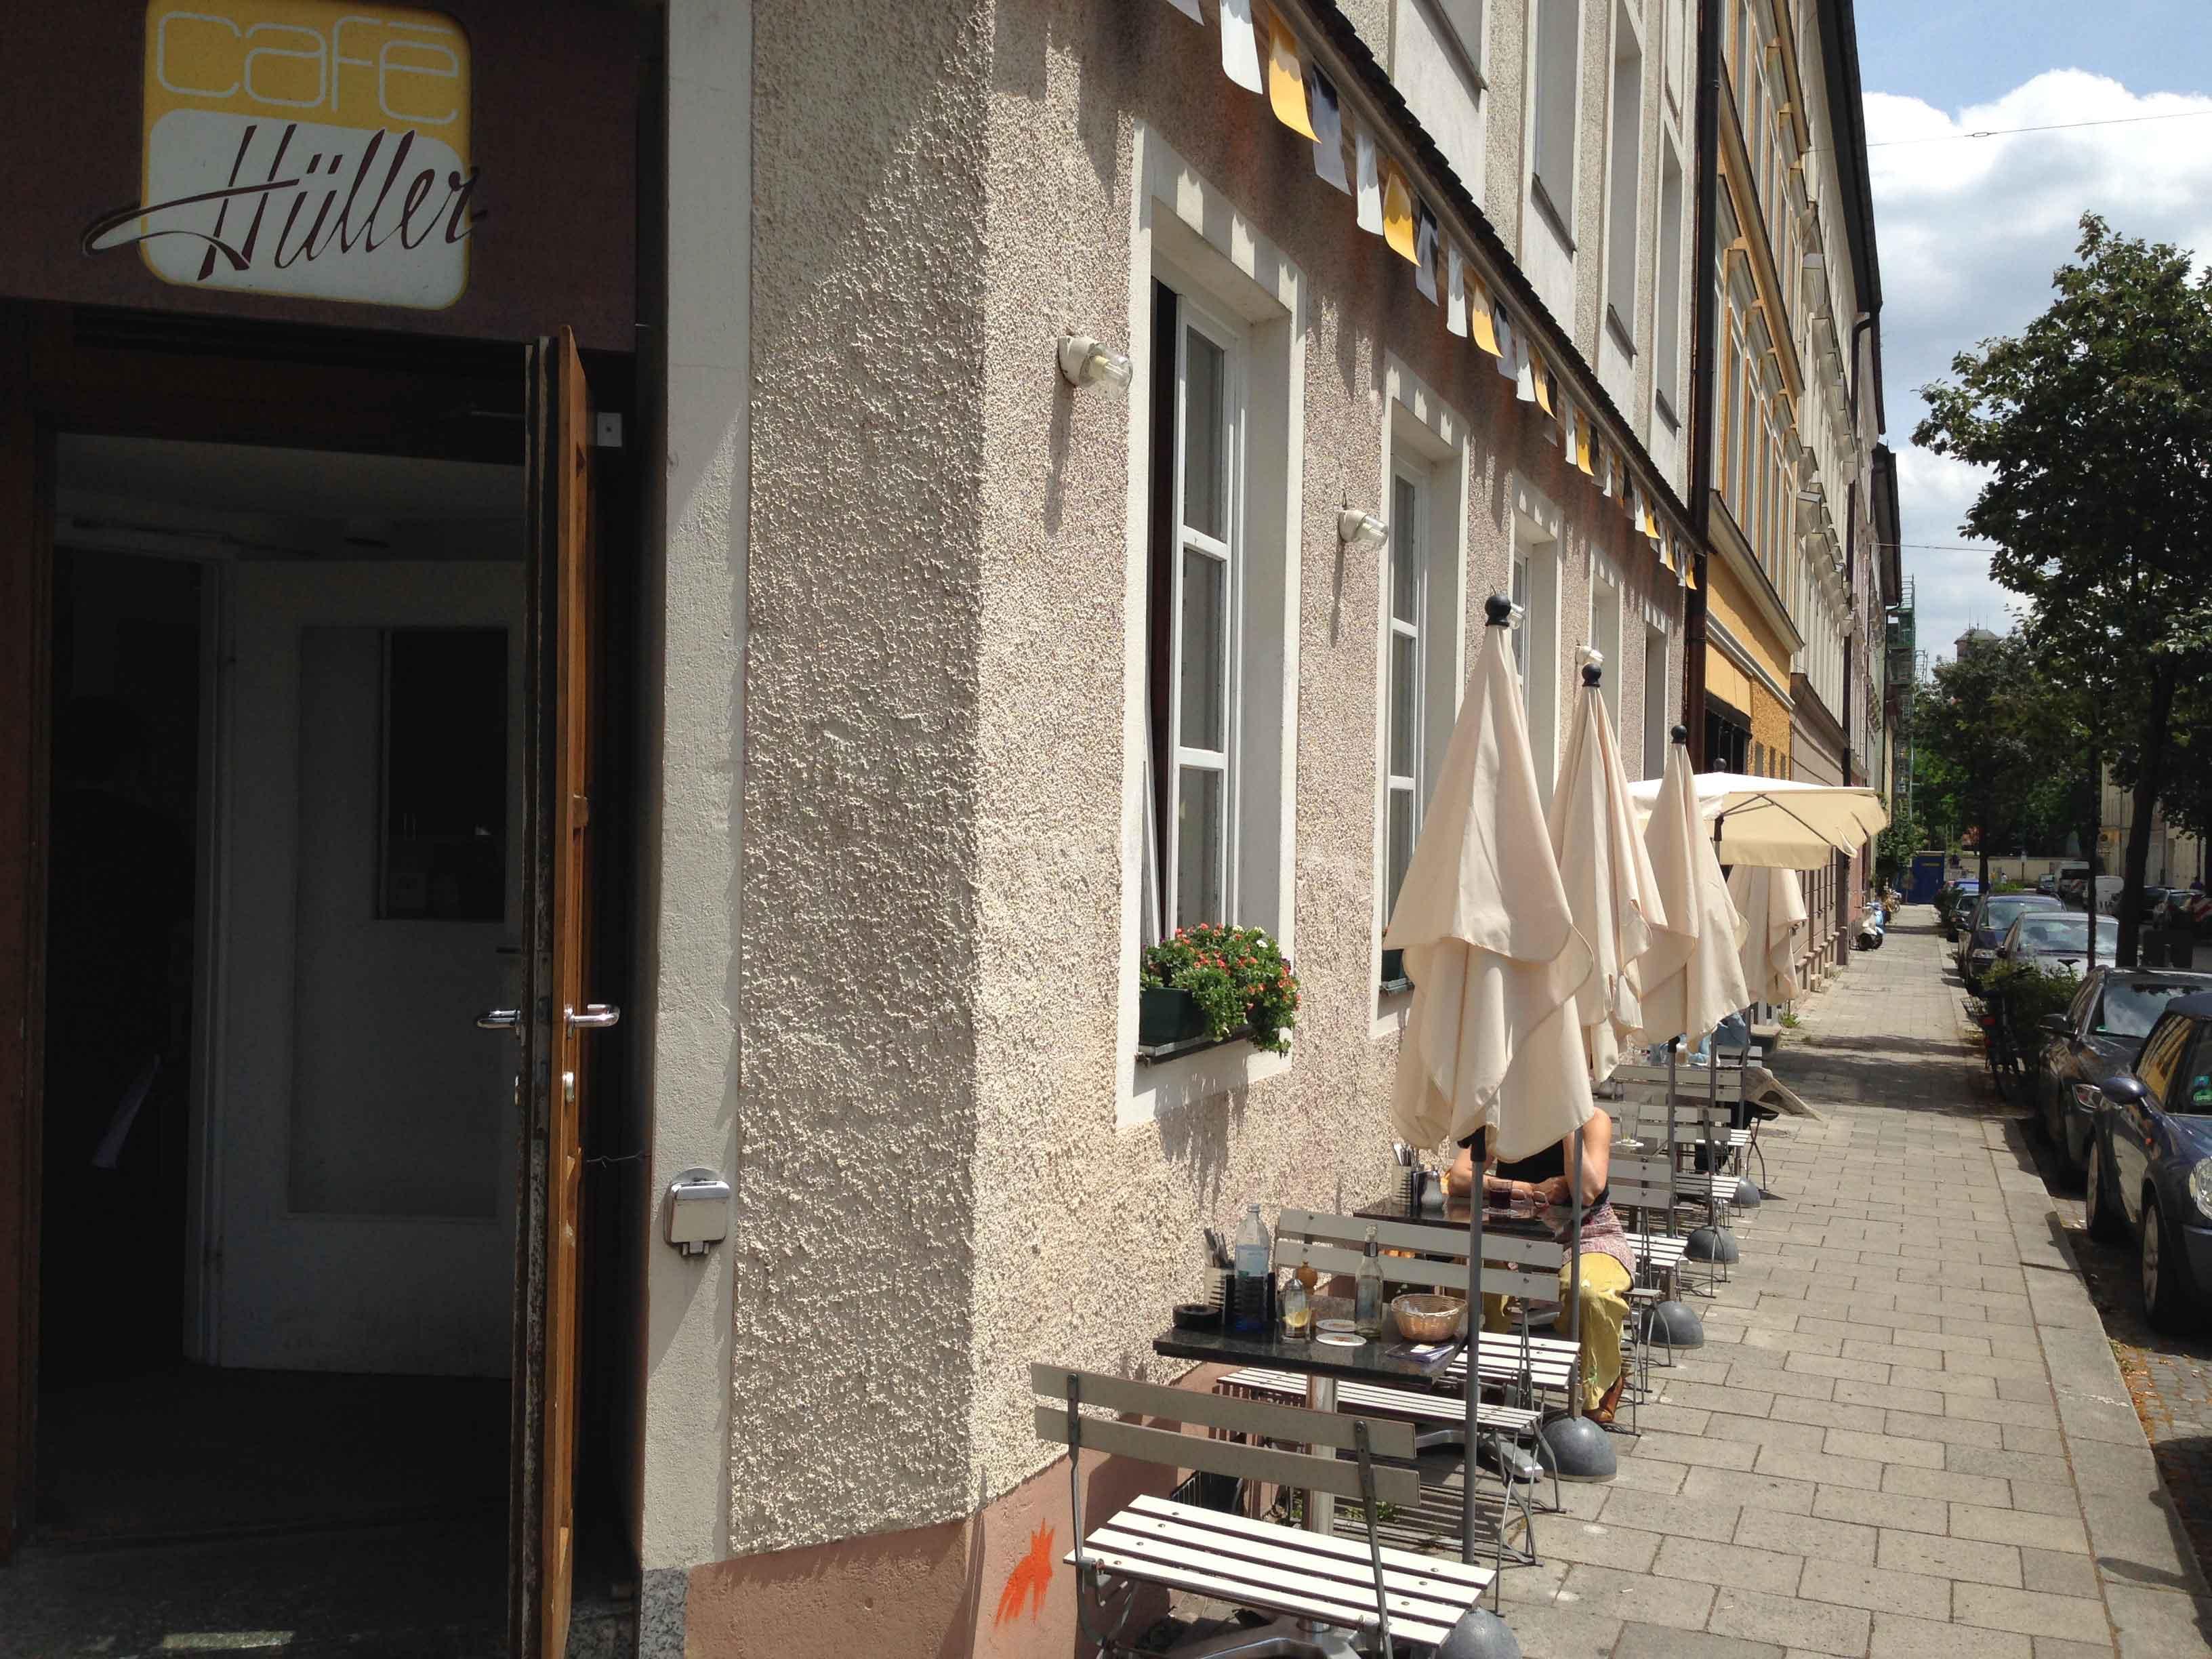 Cafe Huller Fruhstuck Munchen In Der Au